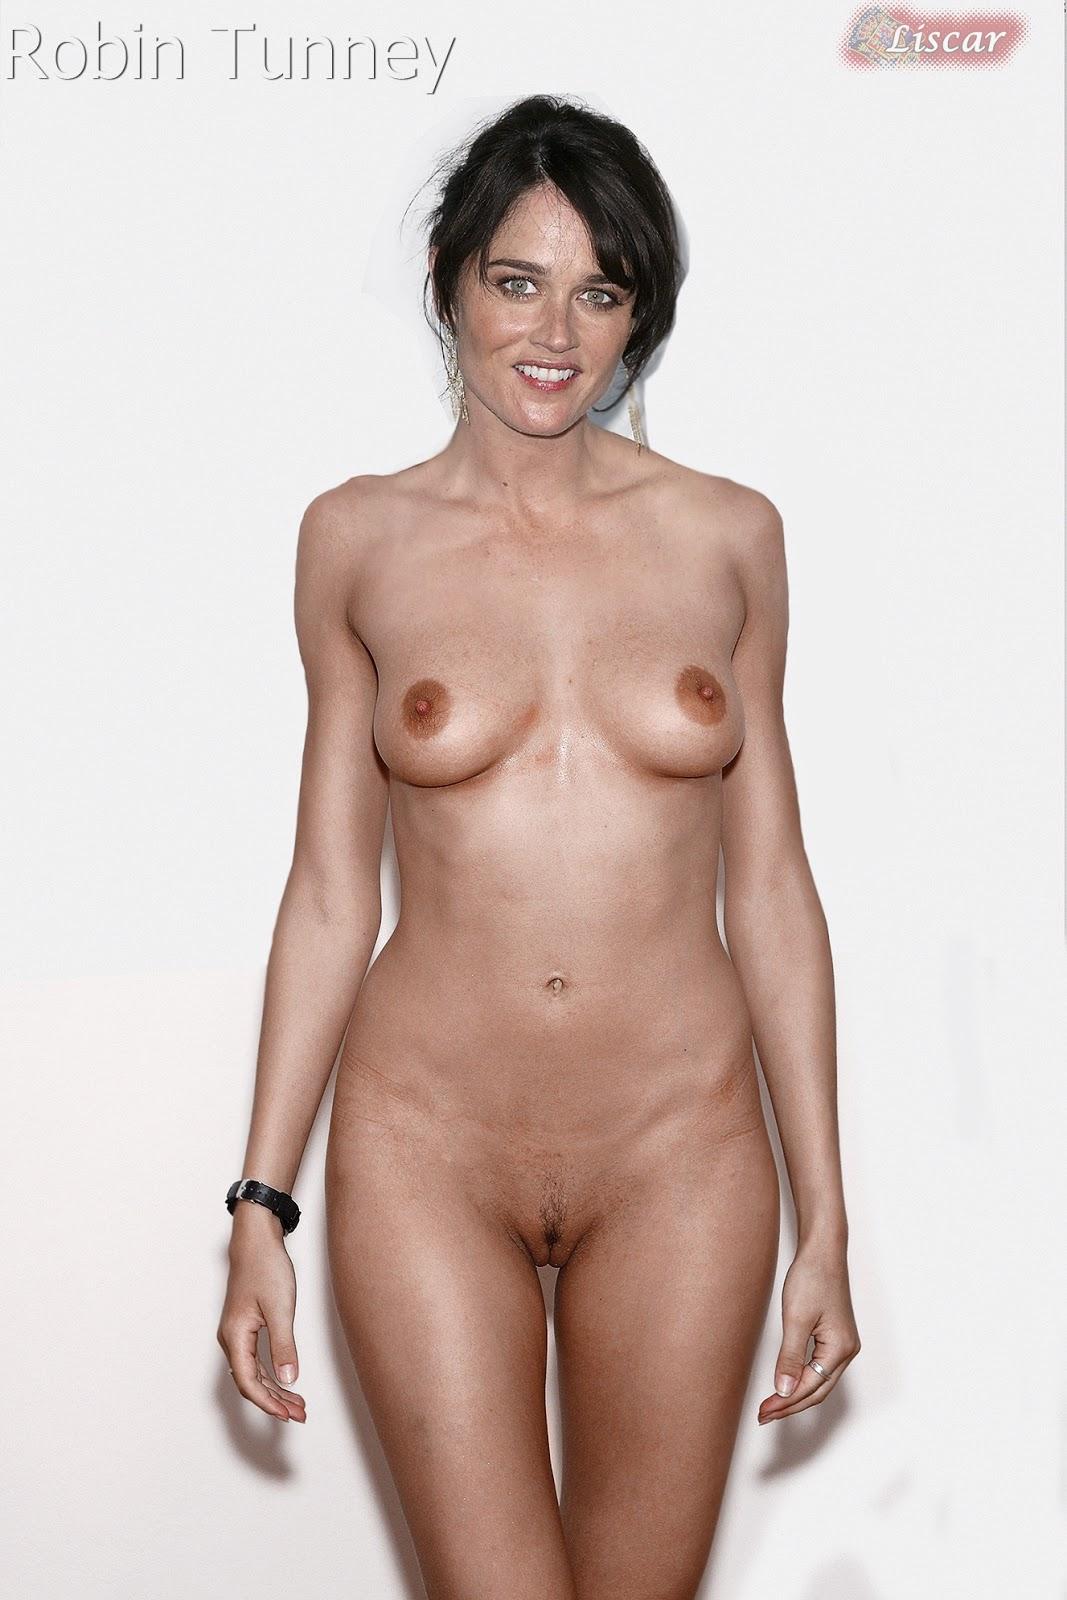 Adrian Actor Porno Desnudo anybody in nude no fake - hot porno